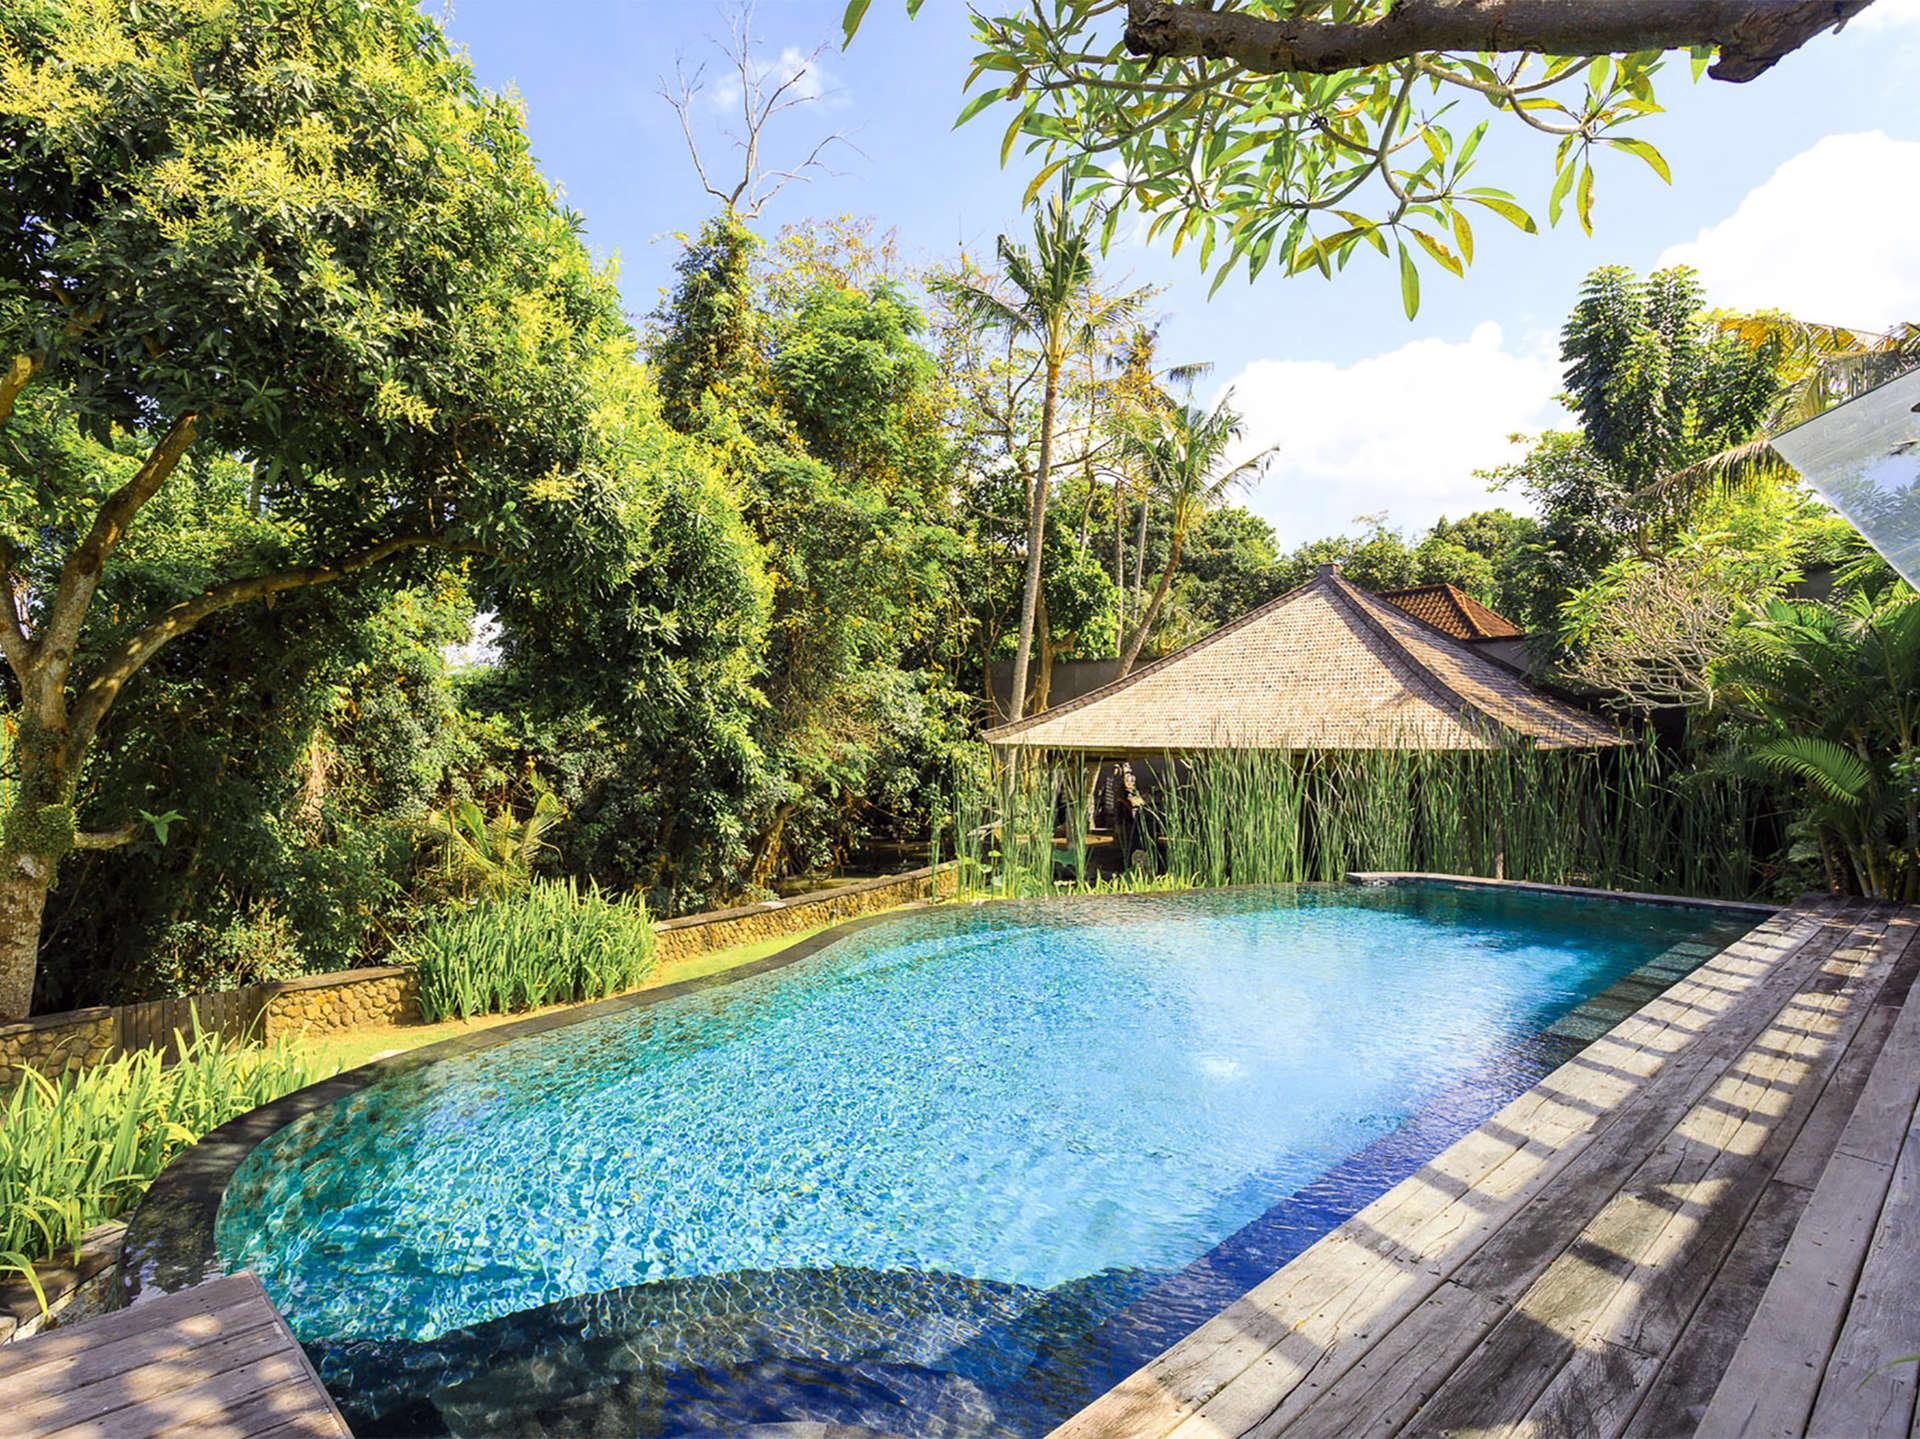 Luxury villa rentals asia - Indonesia - Bali - Canggu - Hansa - Image 1/20